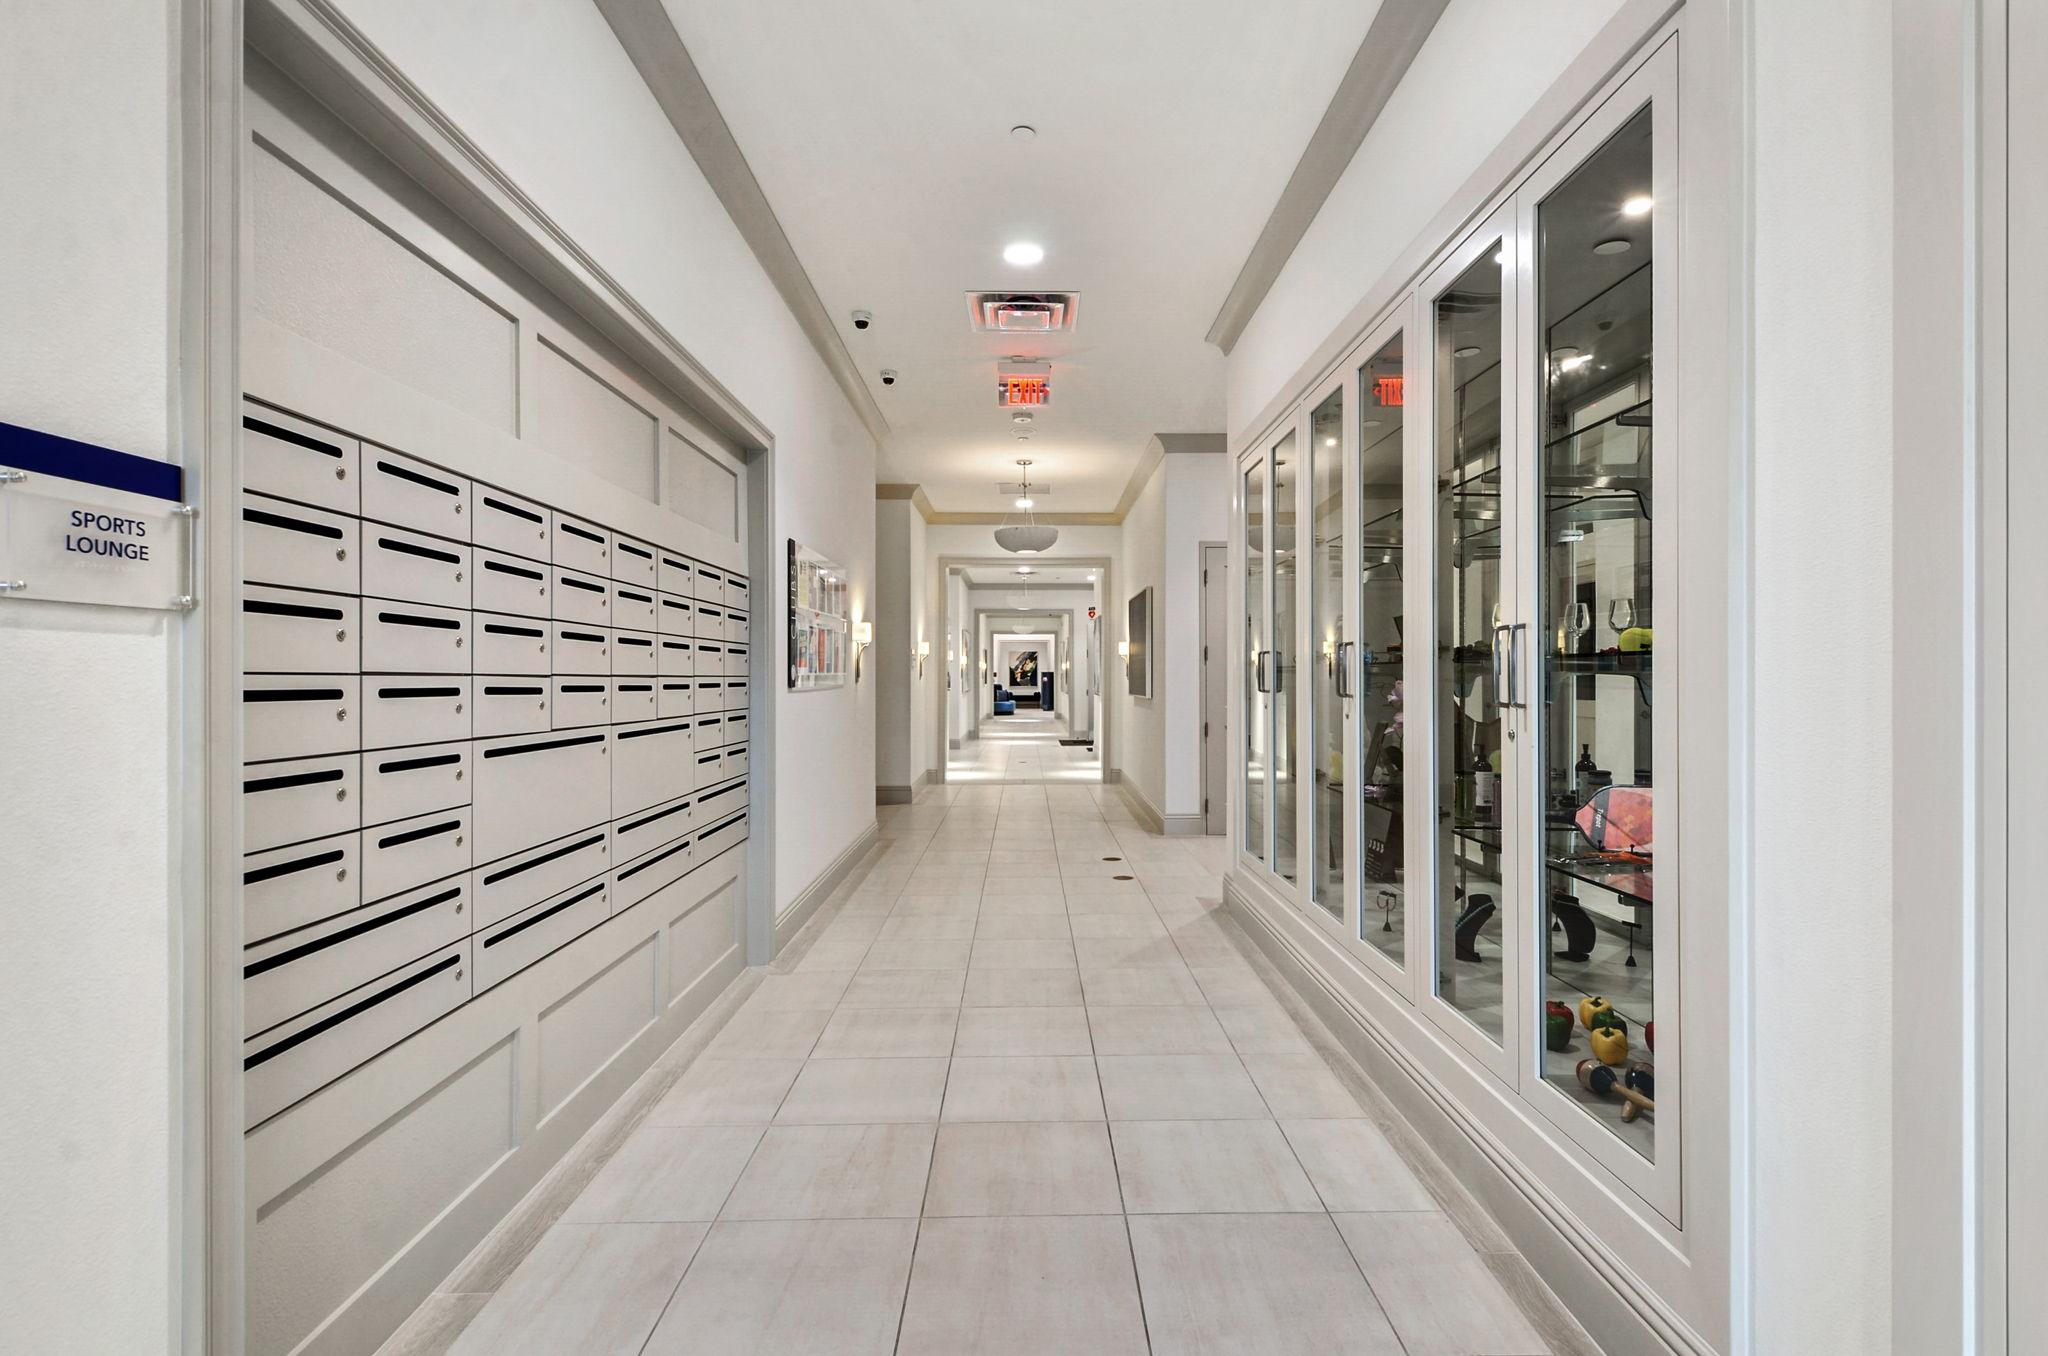 Hallway with homeowner display case